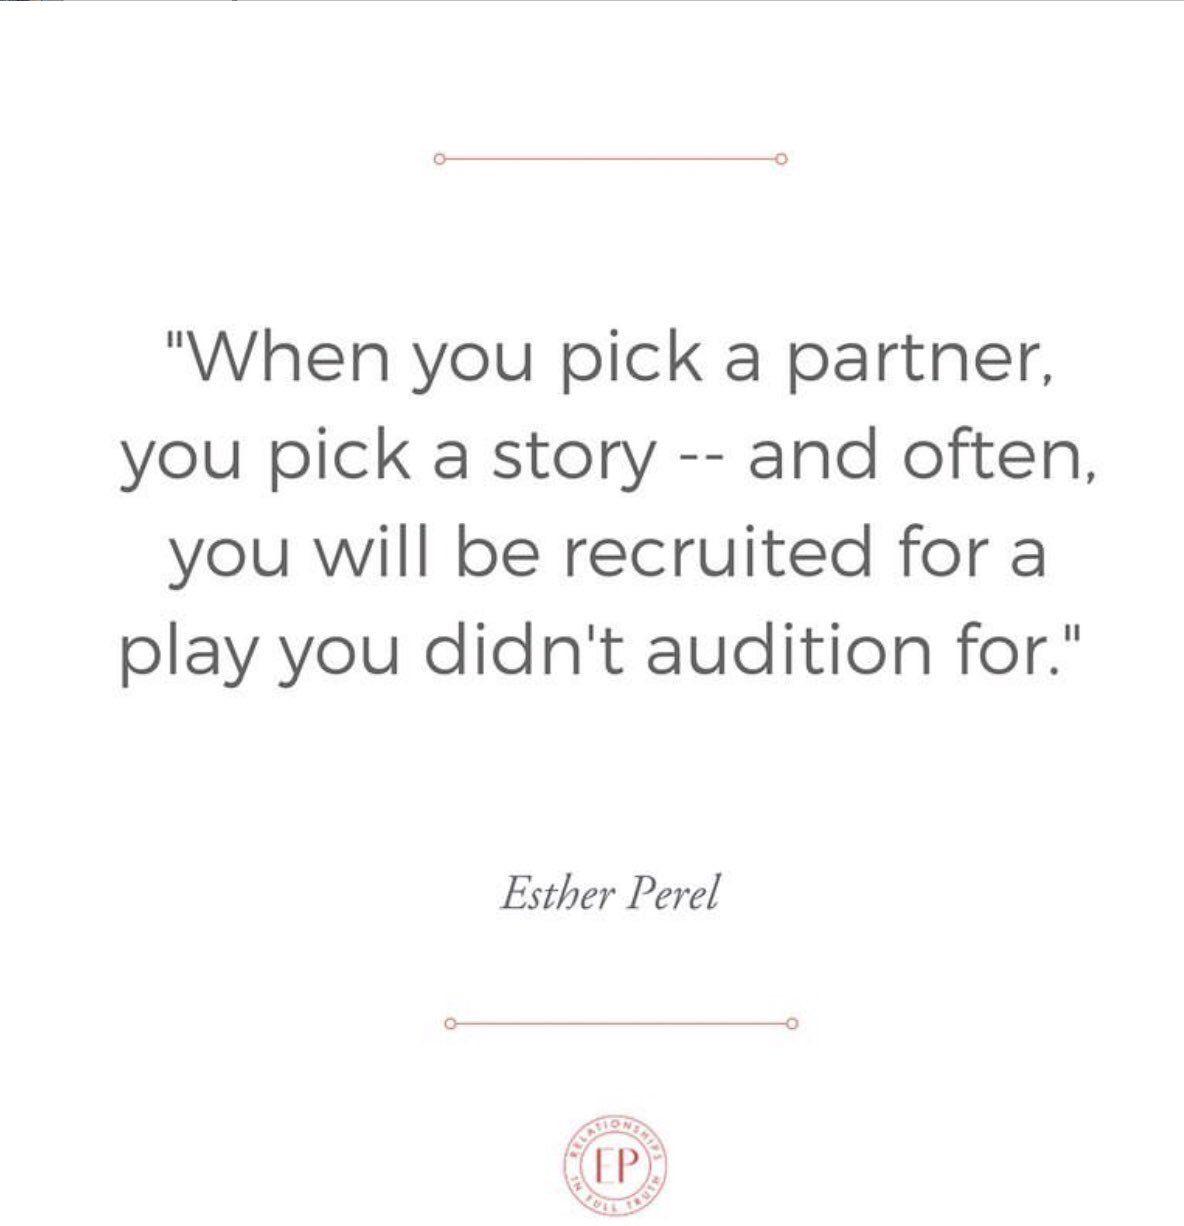 Esther perel quotes